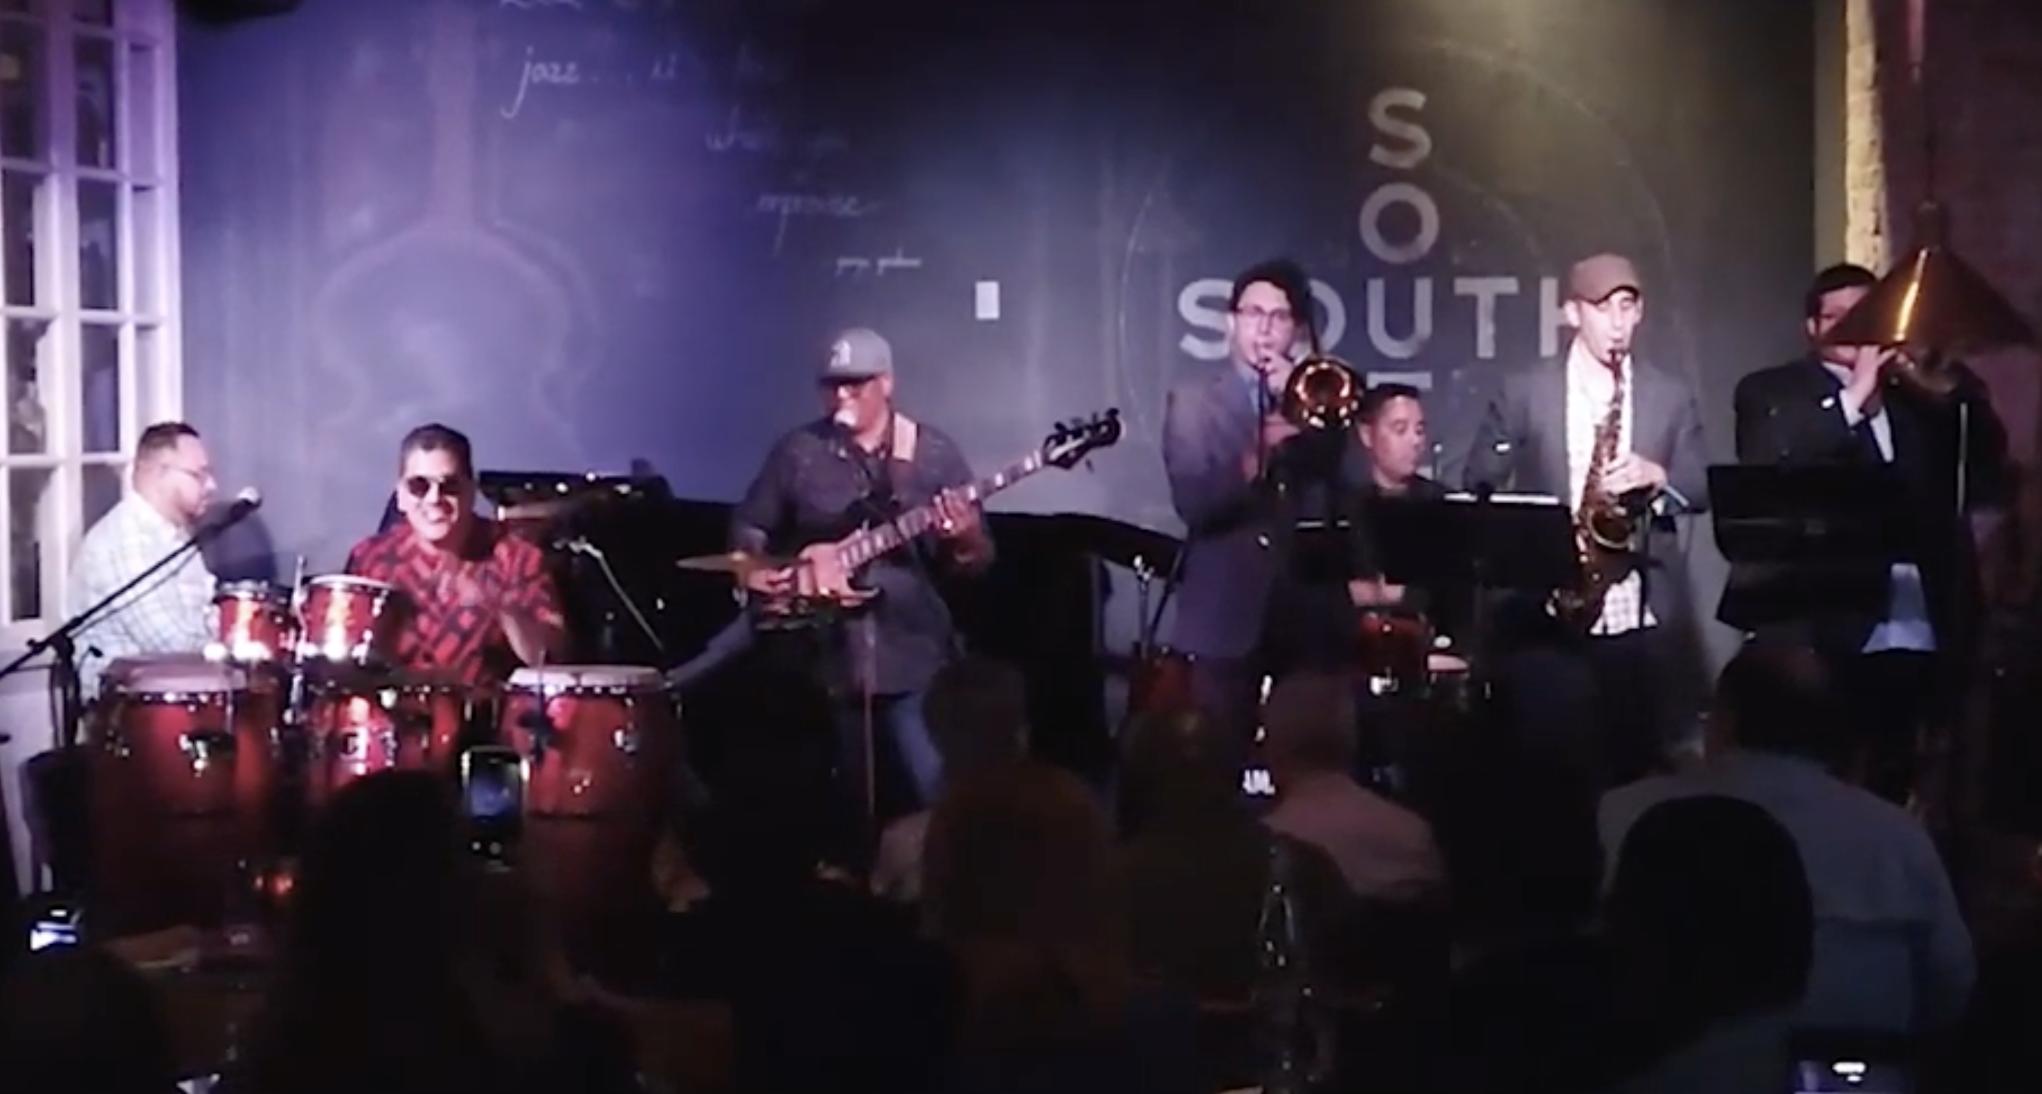 Pablo Batista Latin Jazz Ensemble featuring Bakithi Kumalo